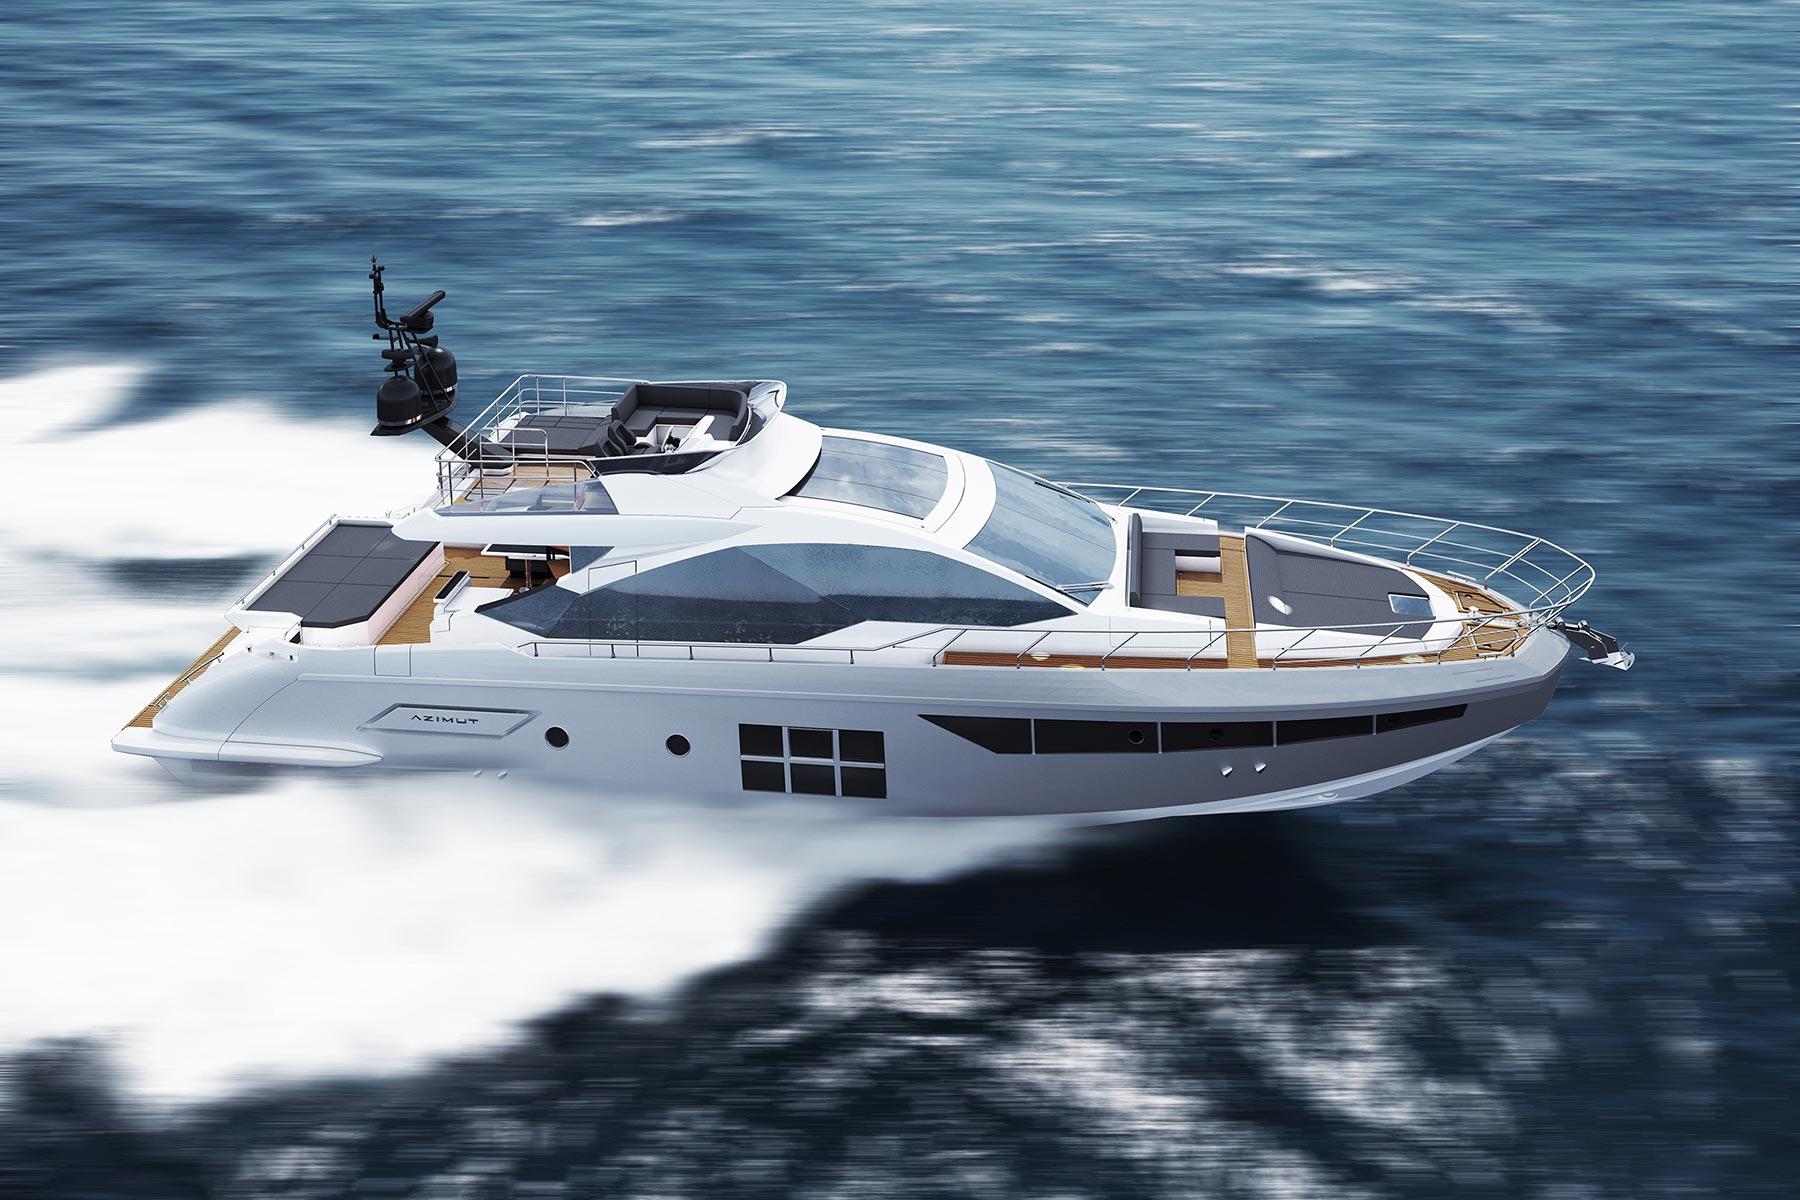 luxusni-jachta-azimut-s7